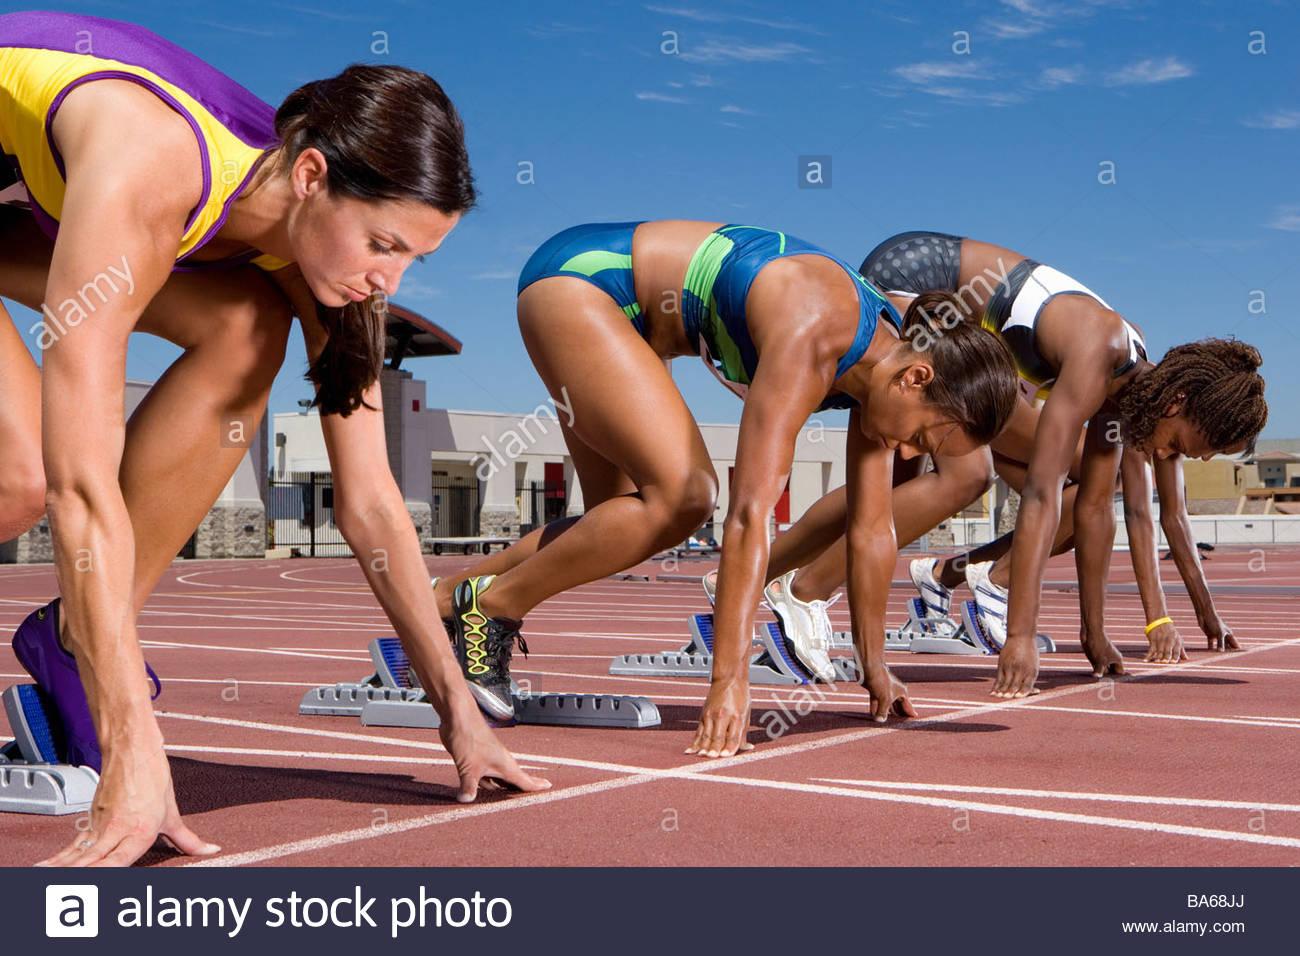 Female runners at starting block kneeling on race track - Stock Image